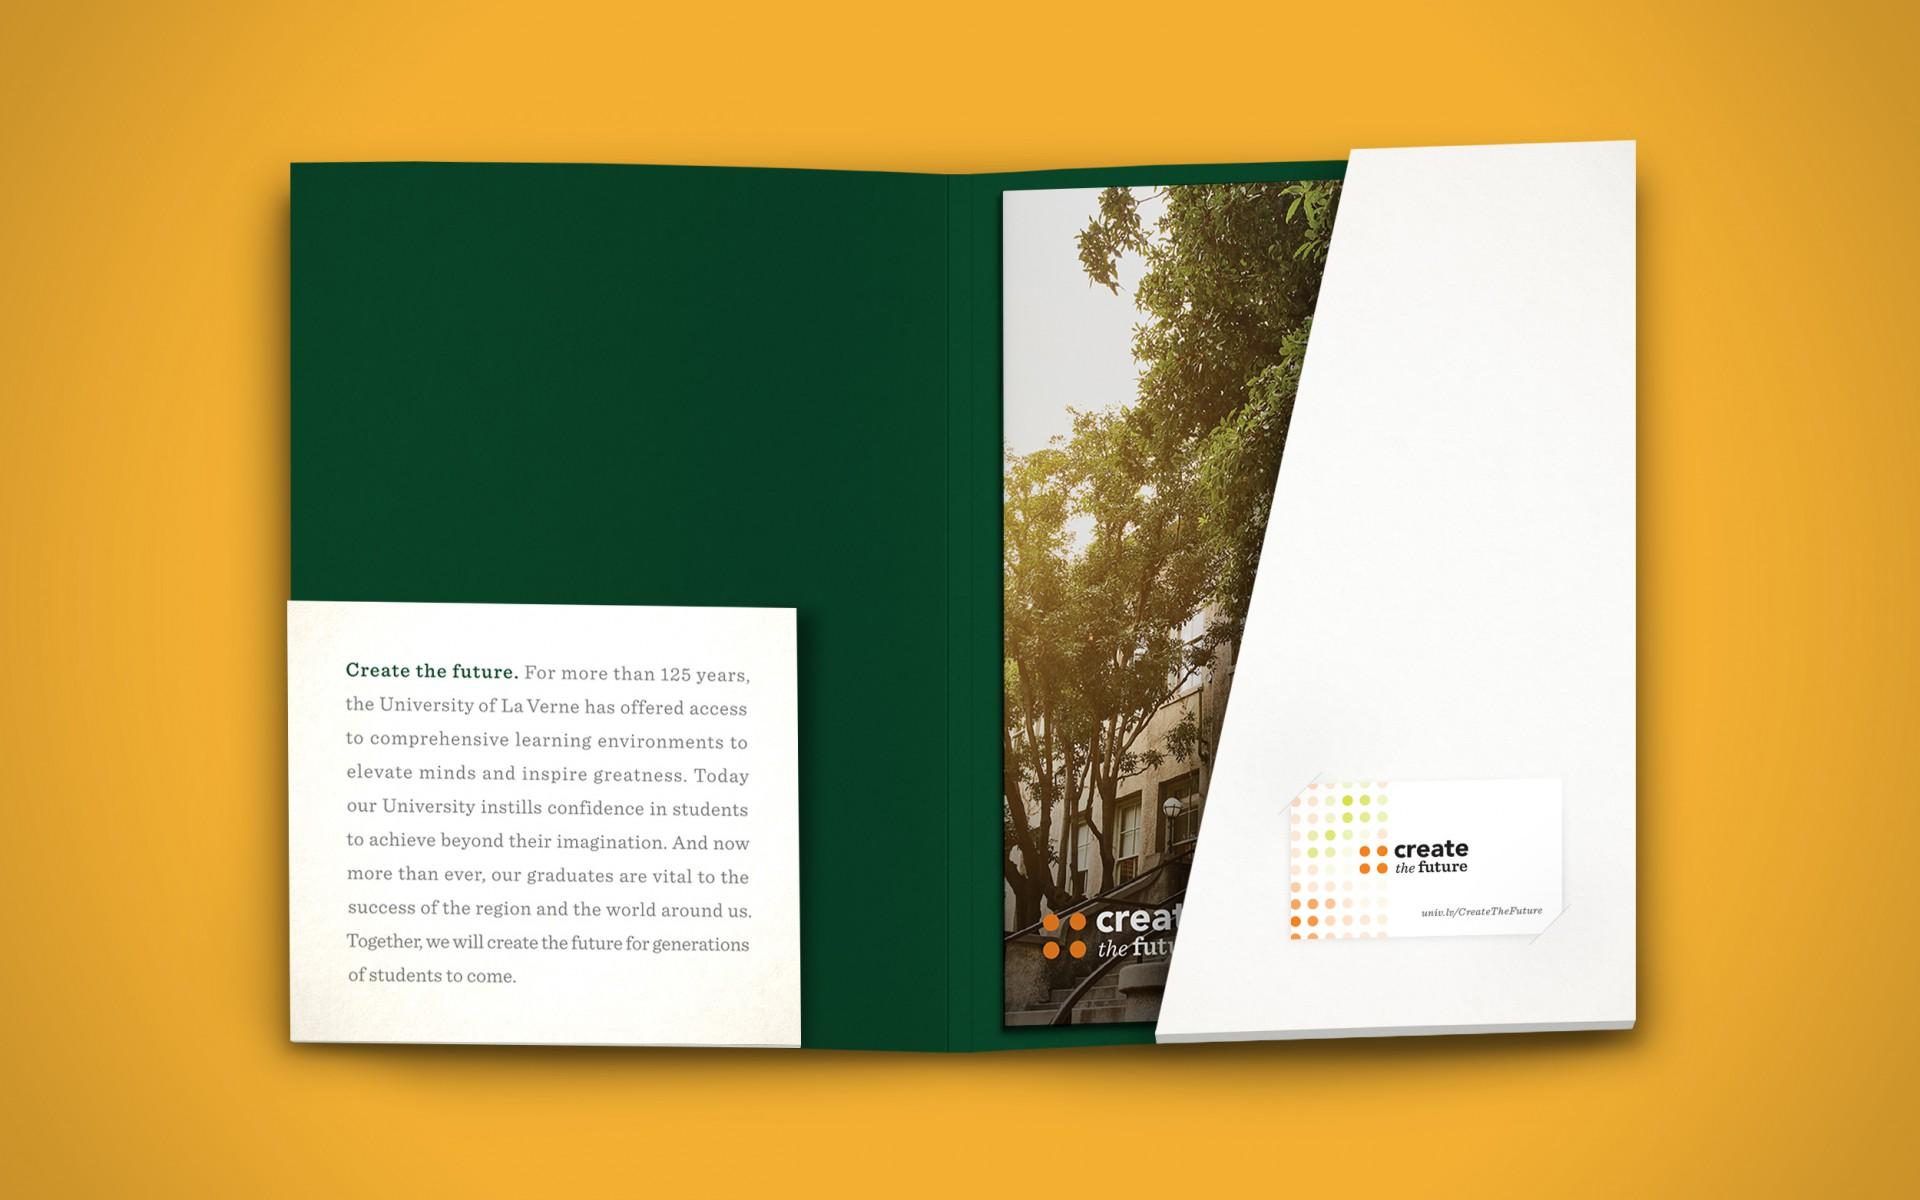 Folder interior and campaign materials